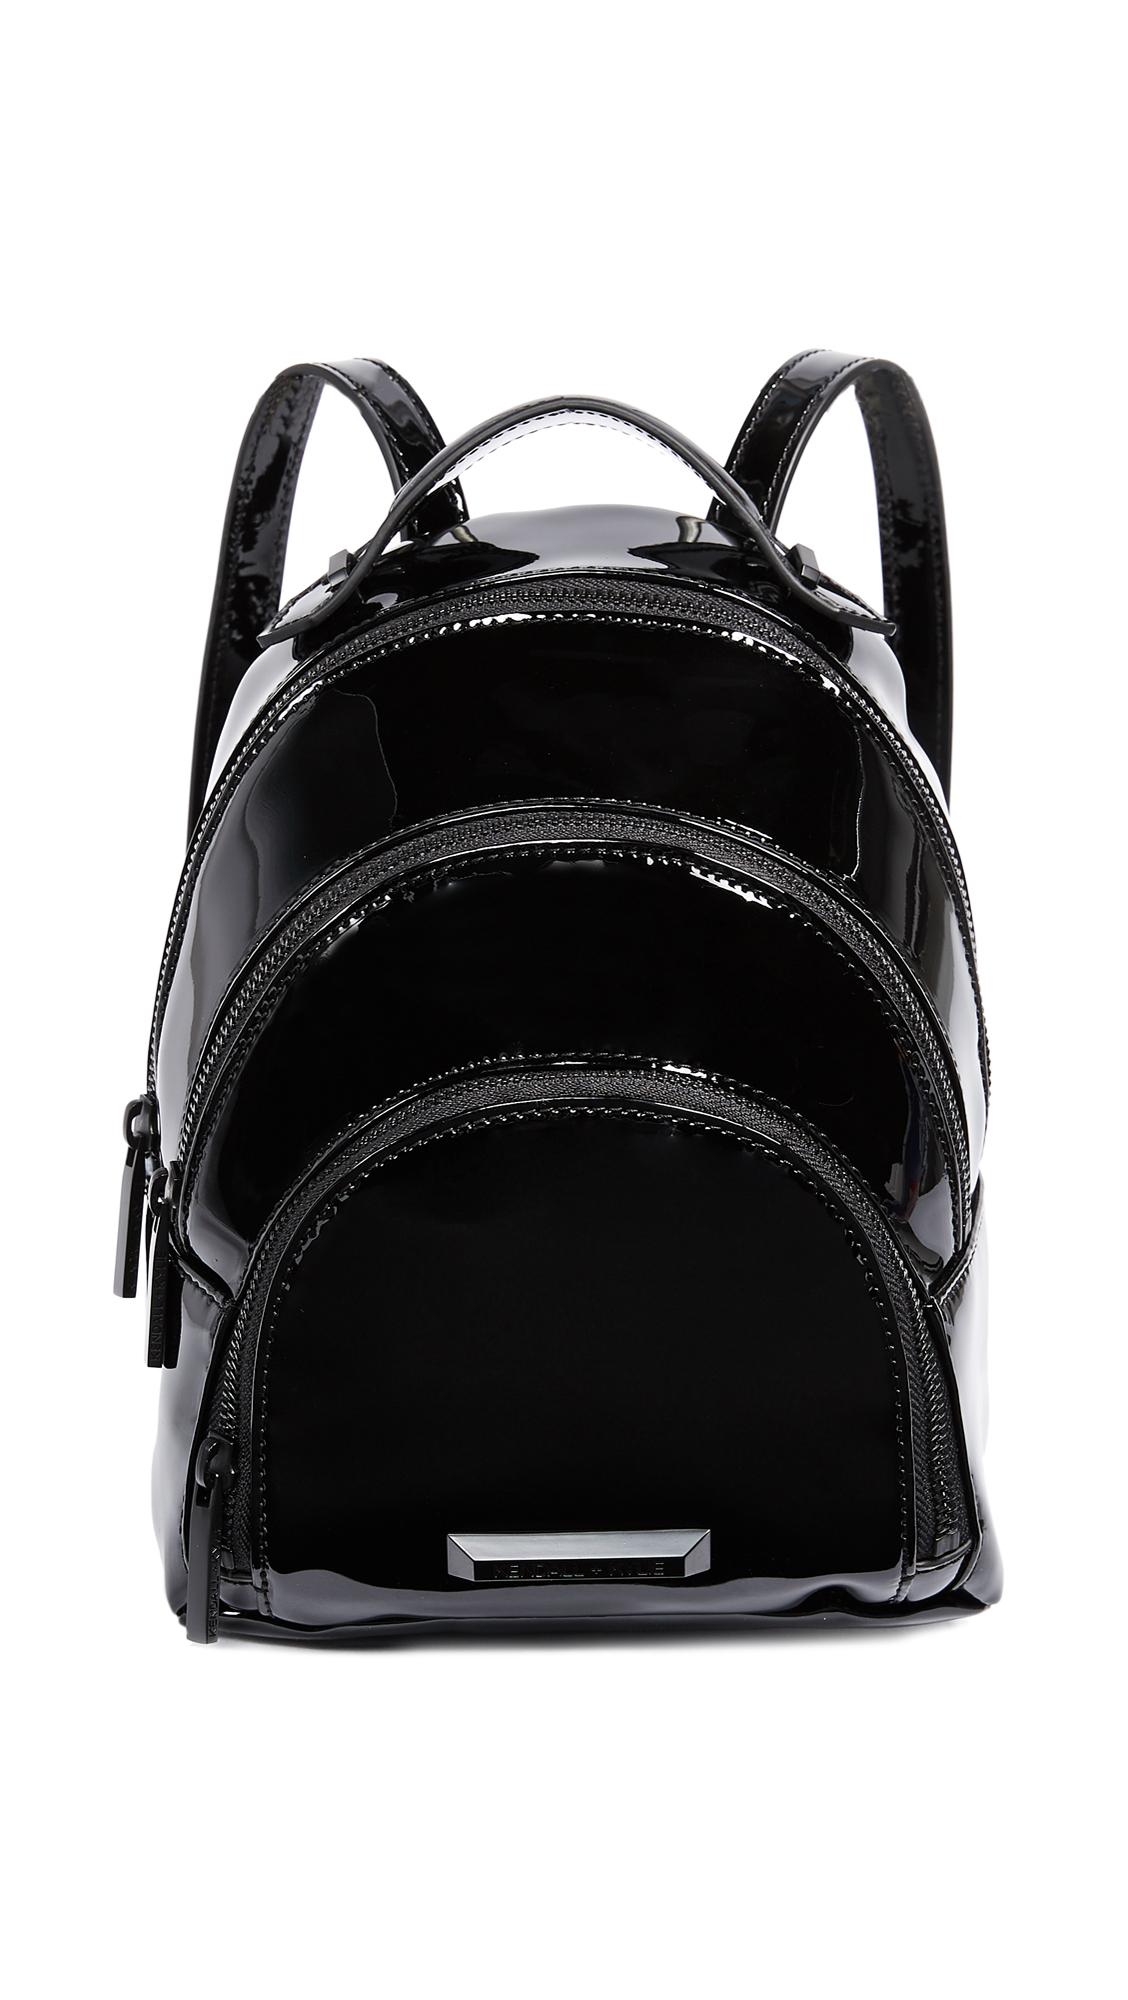 KENDALL + KYLIE Sloane Mini Backpack - Black Patent